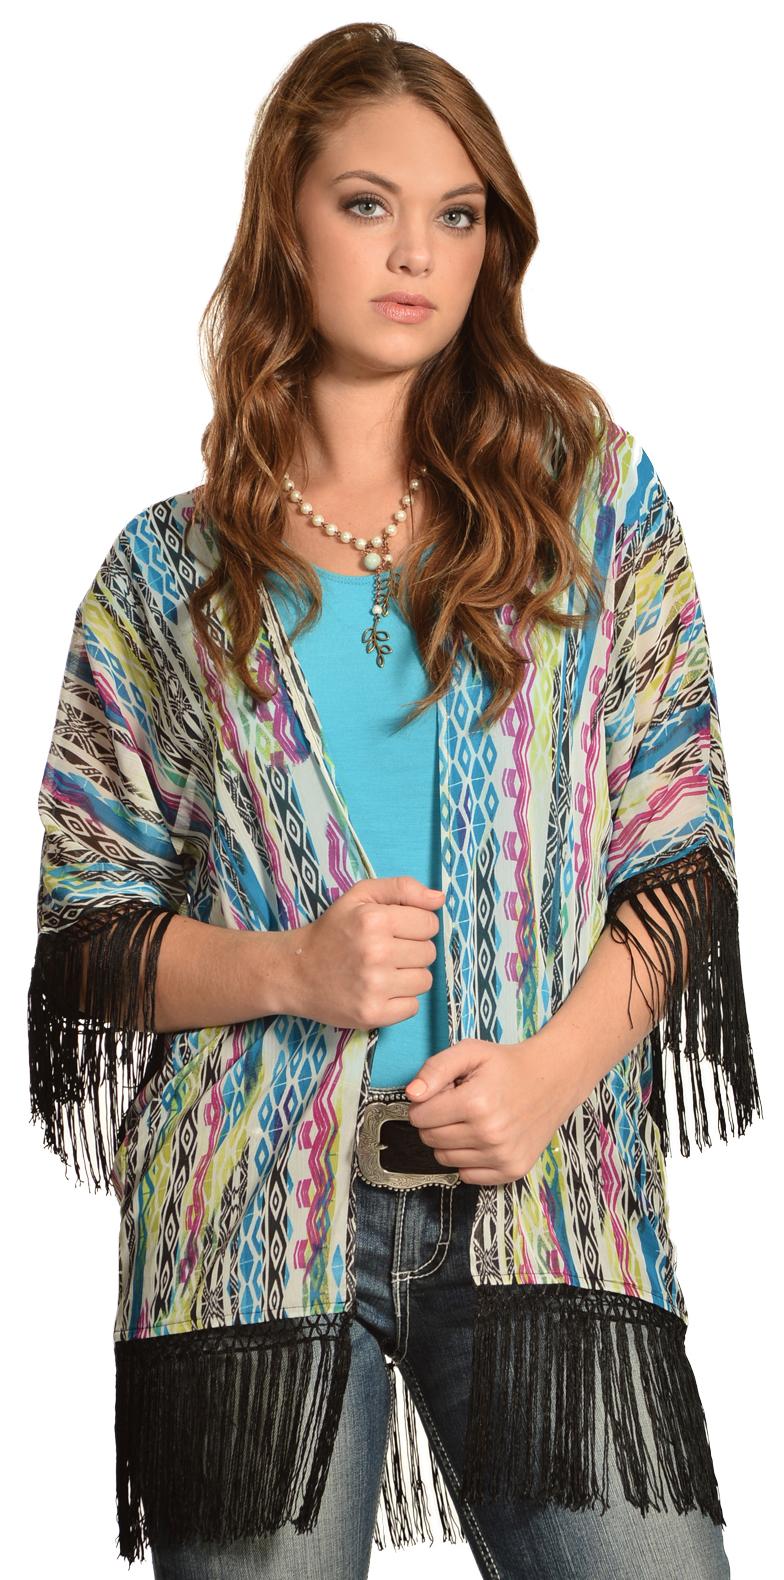 Wrangler Rock 47 Women's Multicolor Tribal Fringe Kimono Cardigan ...